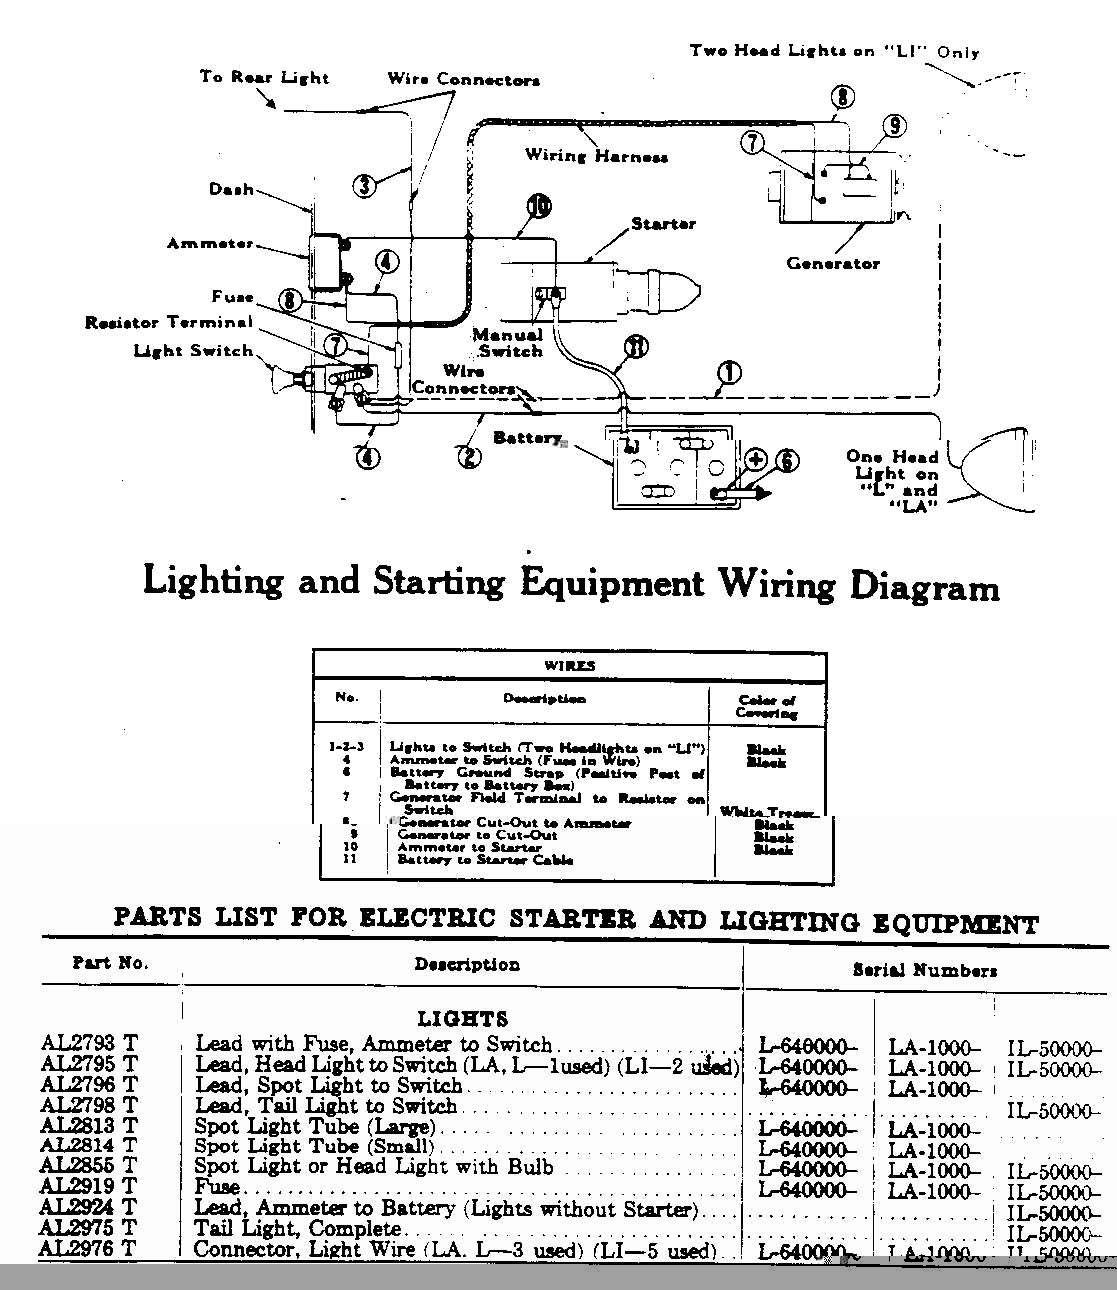 [DIAGRAM_3NM]  John Deere D Wiring Diagram - Wiring Diagrams | 2008 Ford Focus Se Fuse Diagram |  | karox.fr